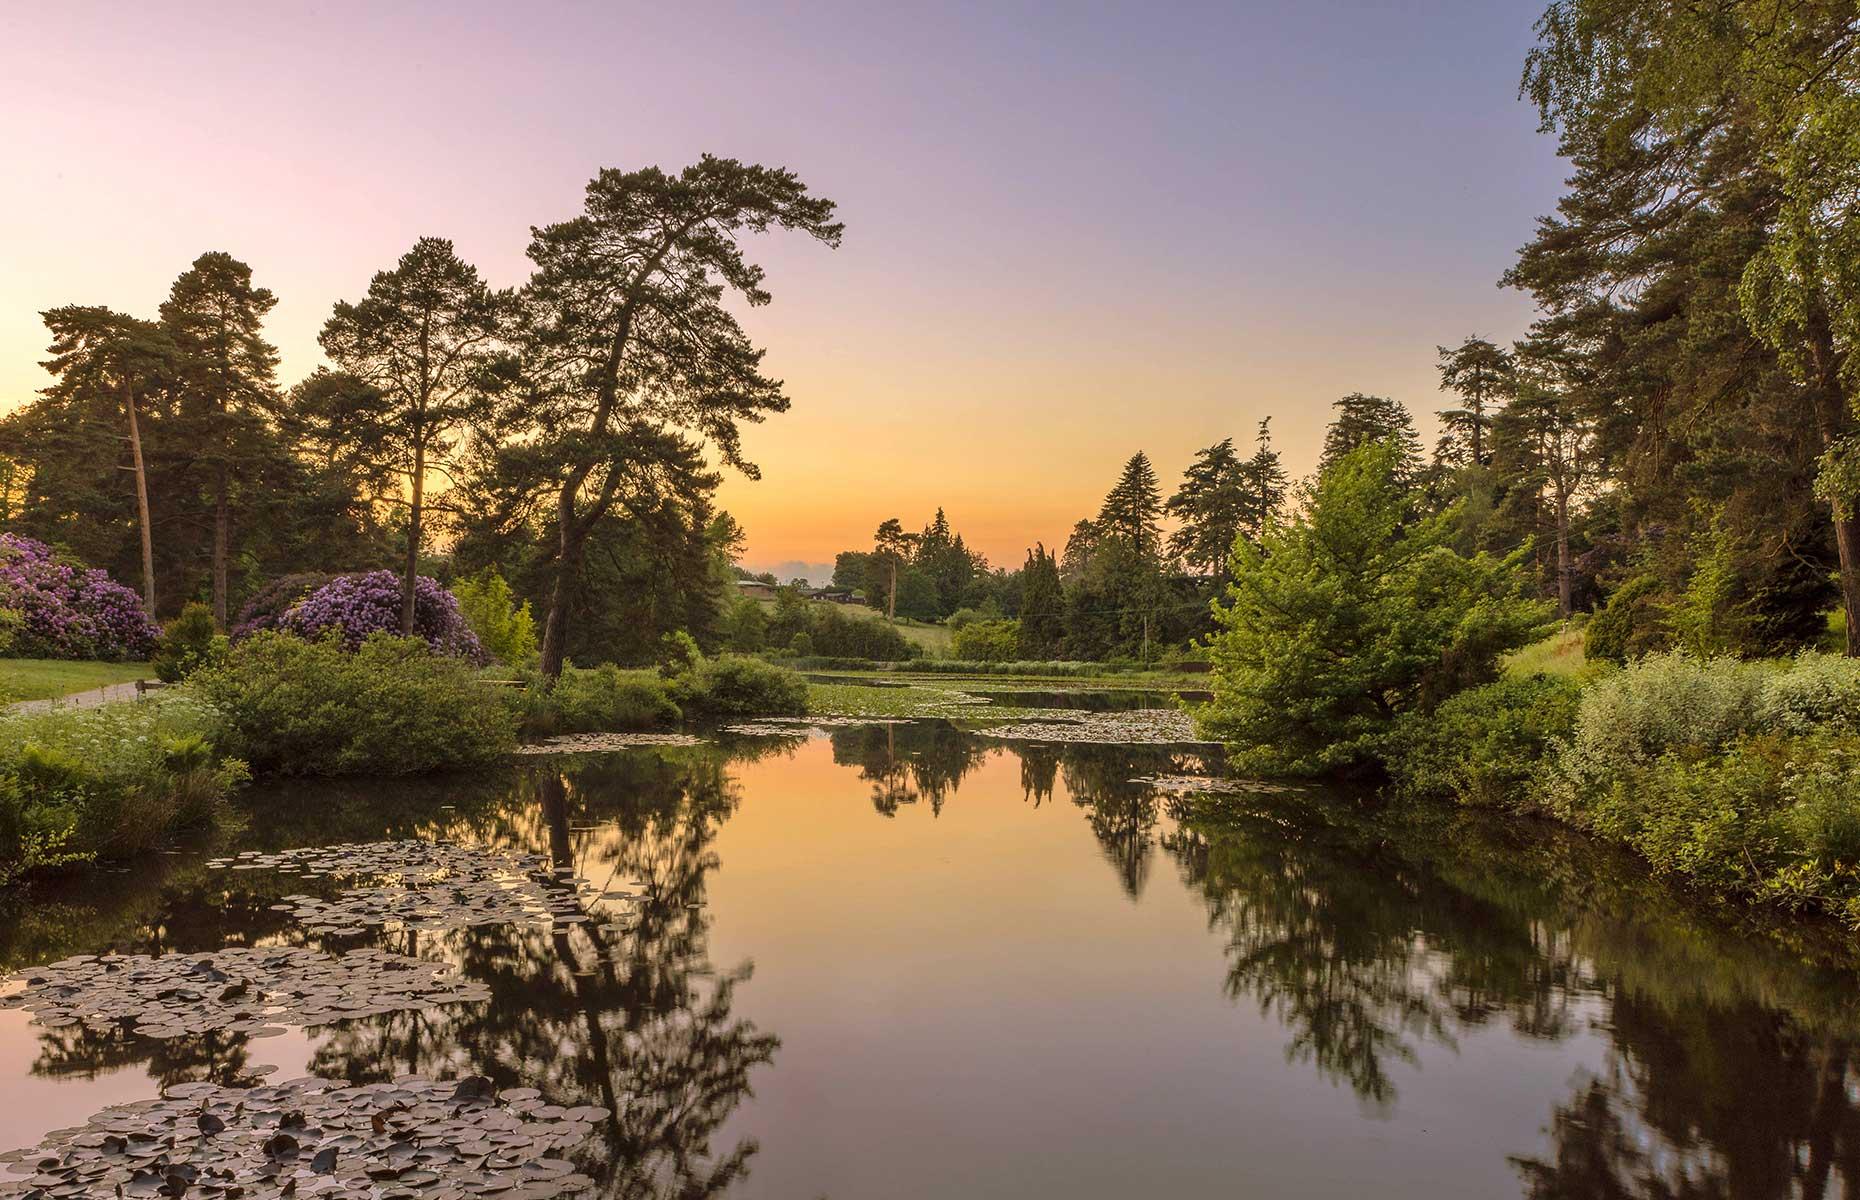 Bedgebury National Pinetum and Forest (Image: Fraser Allen/Shutterstock)